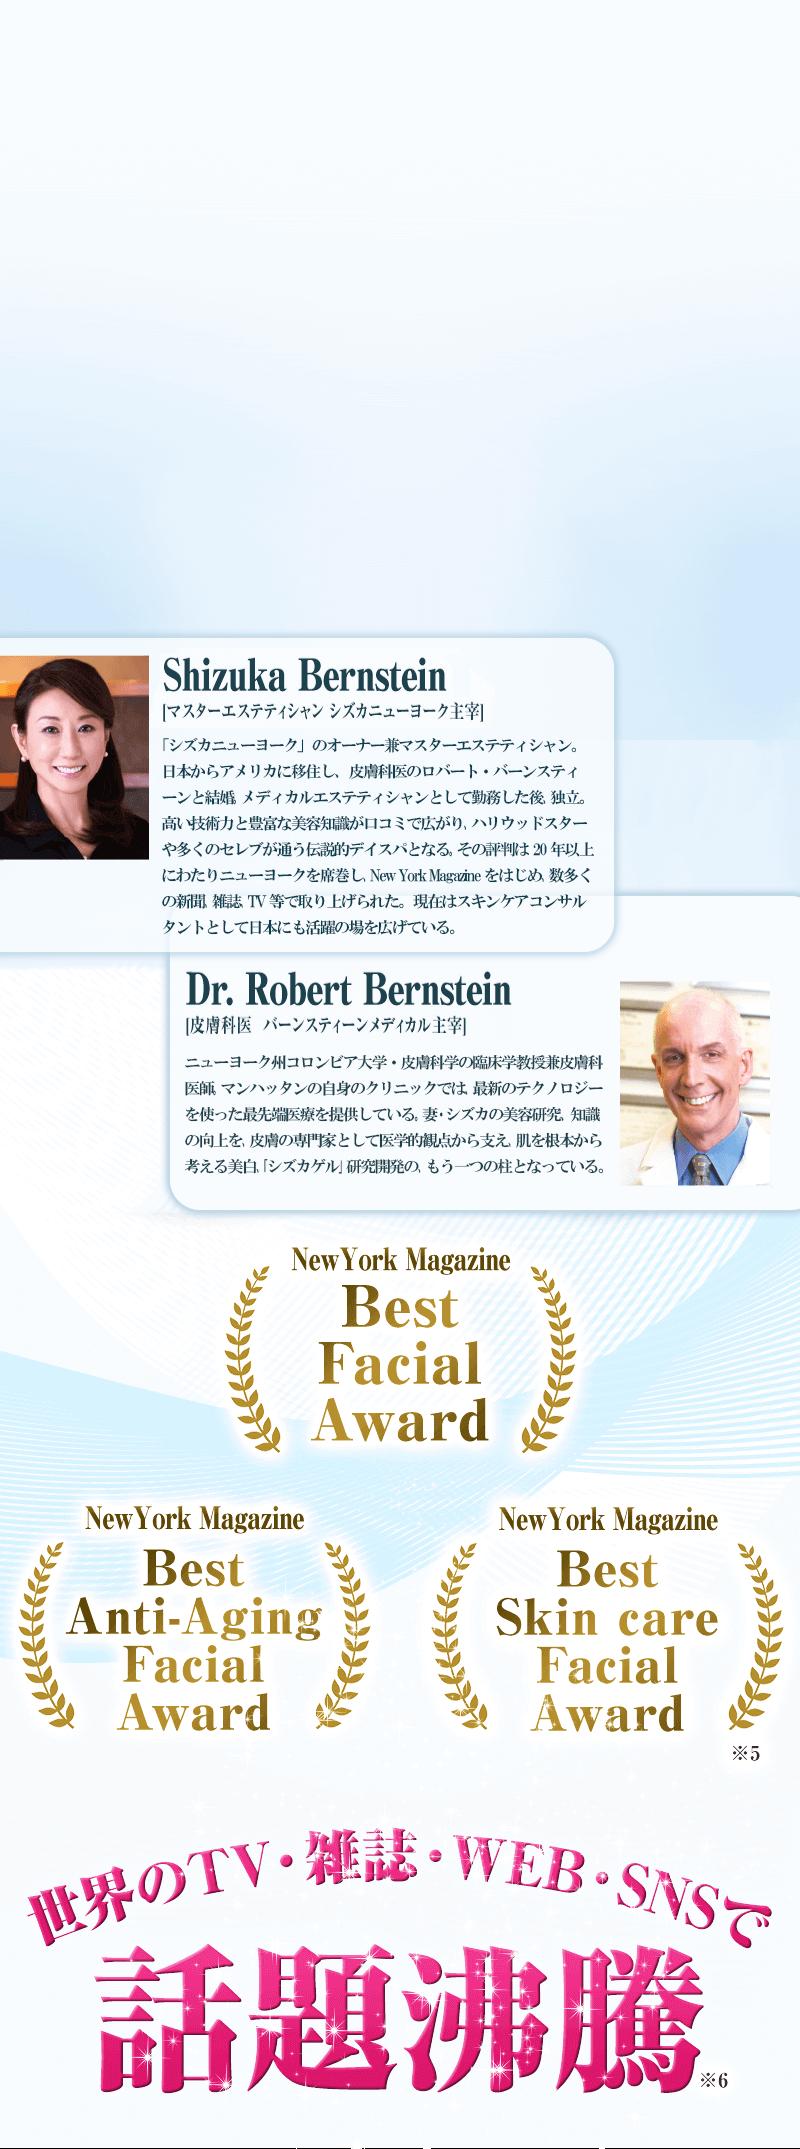 Shizuka Bernstein[マスターエステティシャン シズカニューヨーク主宰]:日本からアメリカに移住し、皮膚科医のロバート・バーンスティーンと結婚。1995年から20年以上ニューヨークでエステティシャンとして活躍する彼女の技術に富んだテクニックと豊富な美容知識は、多くの海外セレブを魅了している。 Dr. Robert Bernstein[皮膚科医  バーンスティーンメディカル主宰]:ニューヨーク州コロンビア大学・皮膚科学の臨床学教授兼皮膚科医師。マンハッタンにある自身のクリニックでは、最先端技術を駆使した治療を行っている。妻の美容知識の向上、研究を、医学的観点から支えている。(※5)